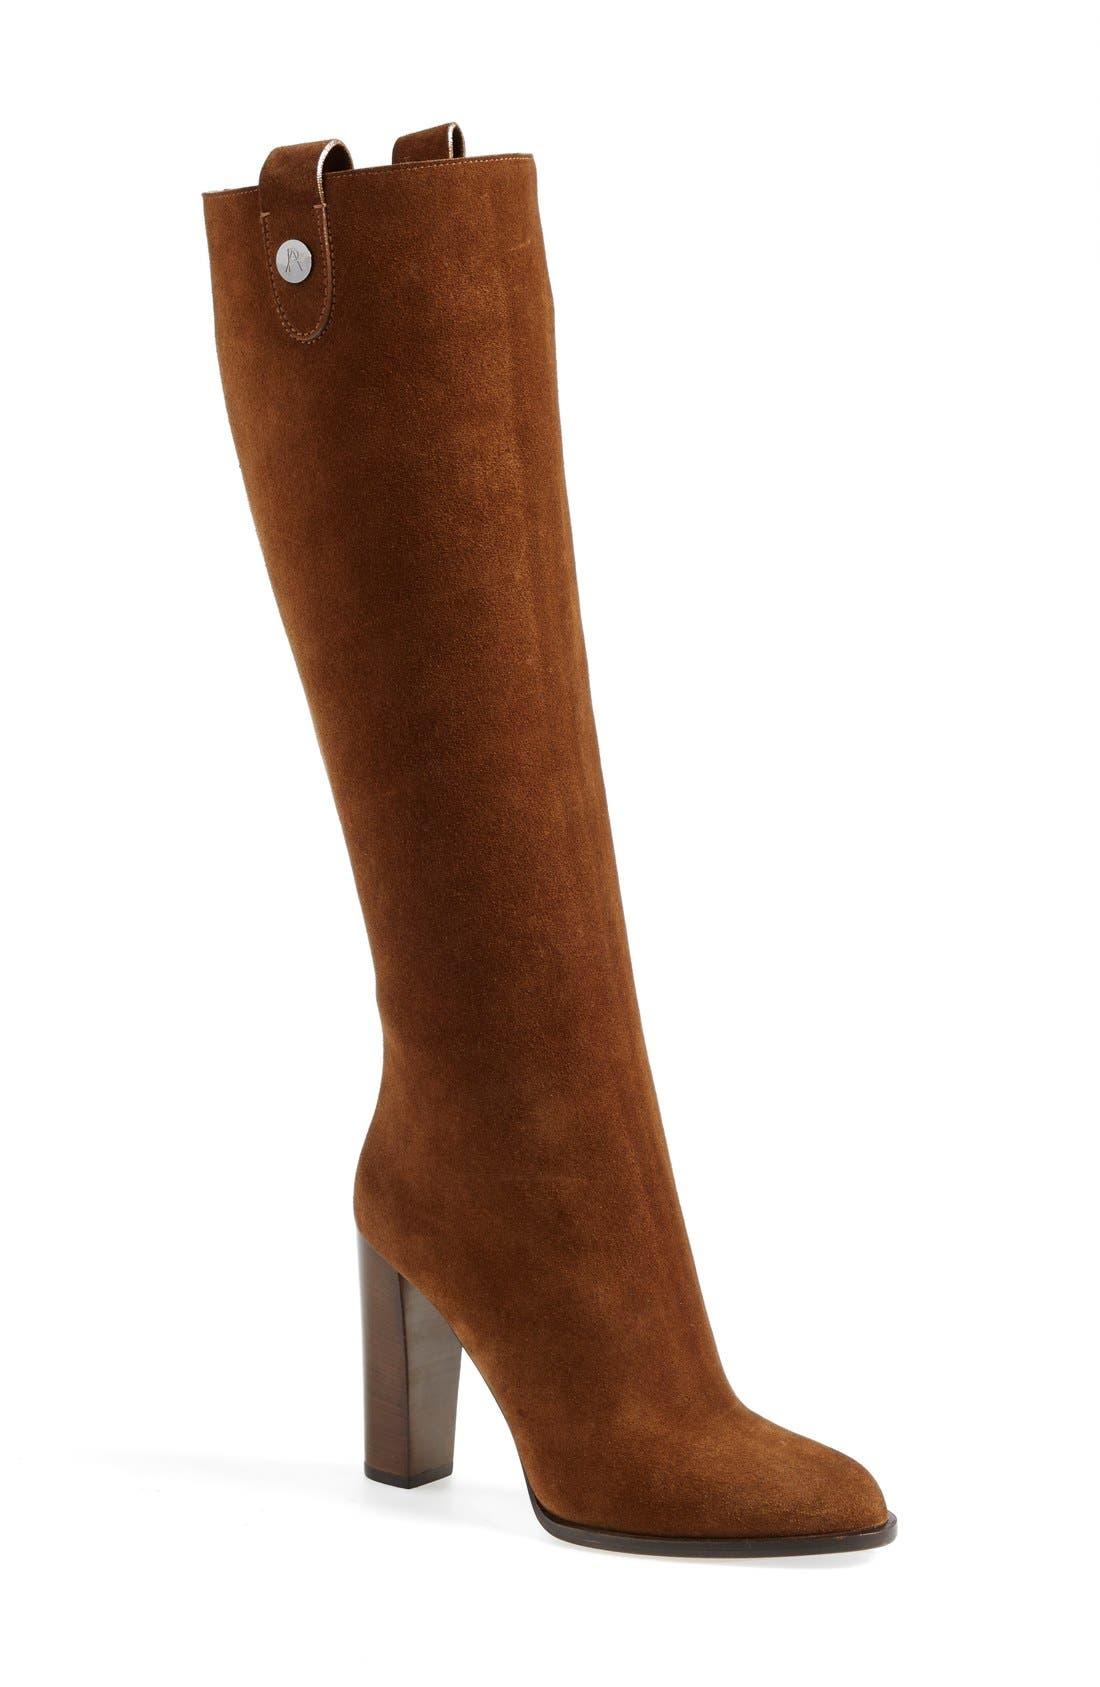 Main Image - Paul Andrew 'Osman' Knee High Boot (Women)